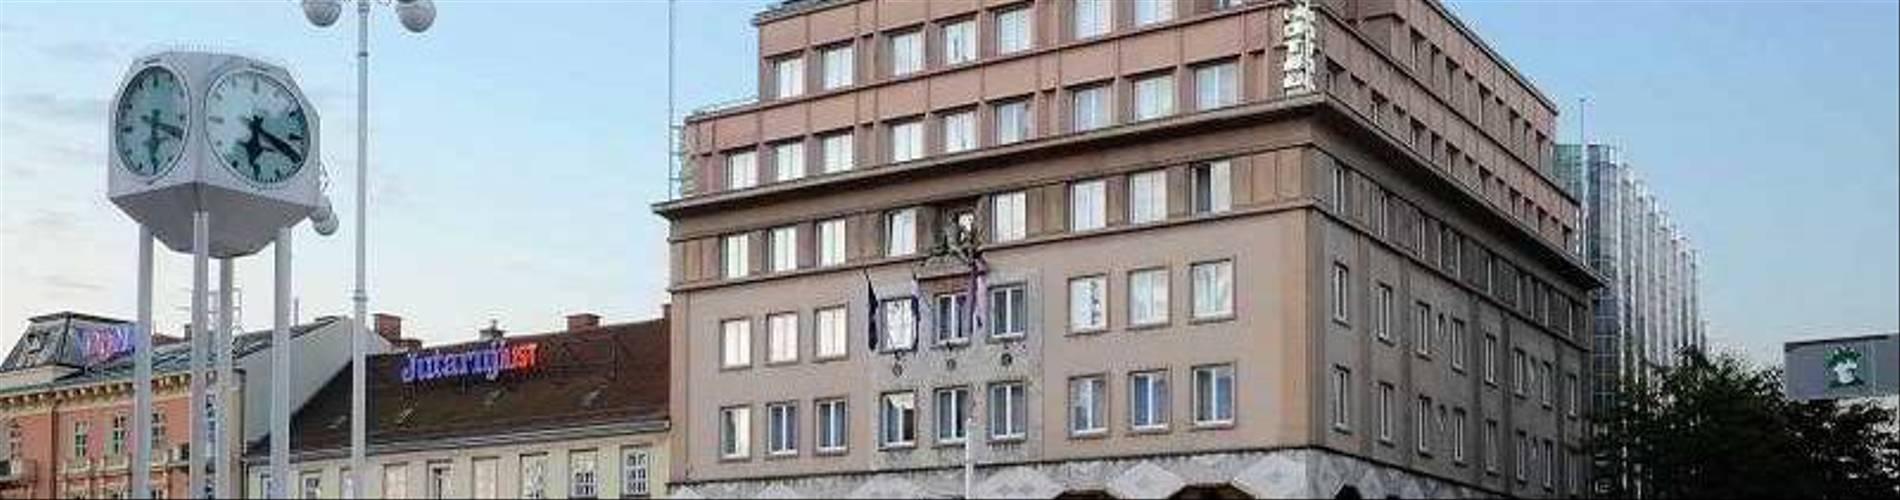 rsz_1resized_hotel_dubrovnik.jpg